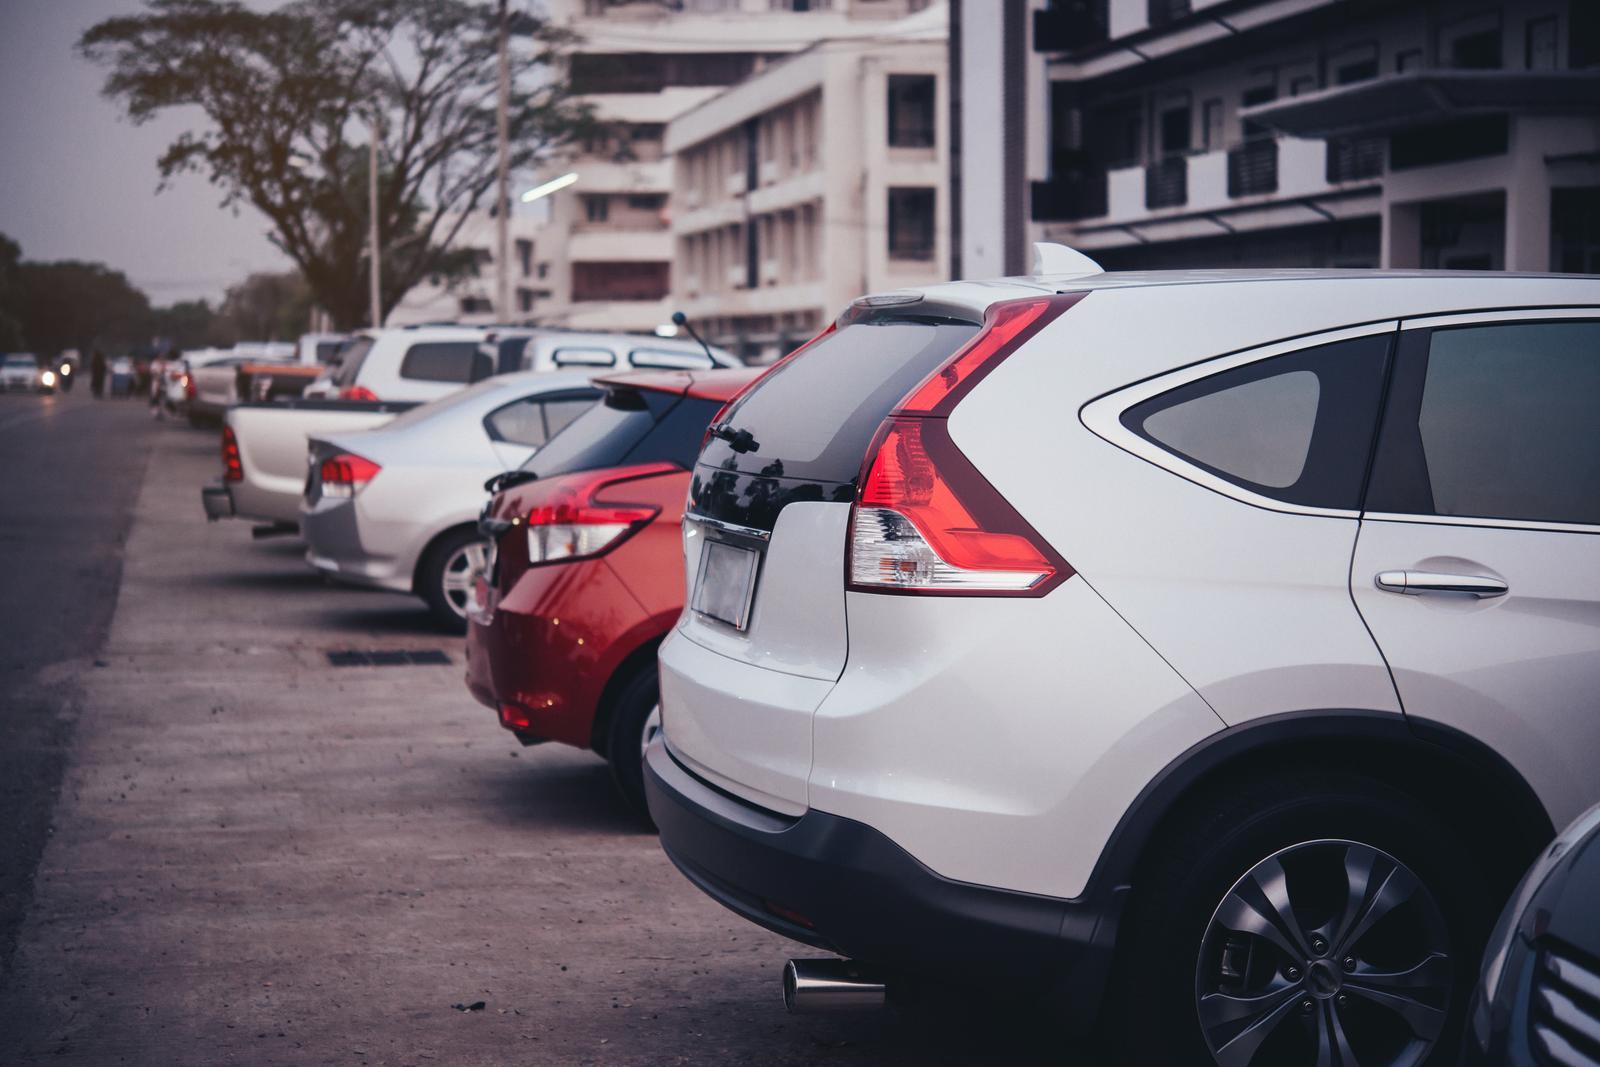 Operation of car parks in Estonia